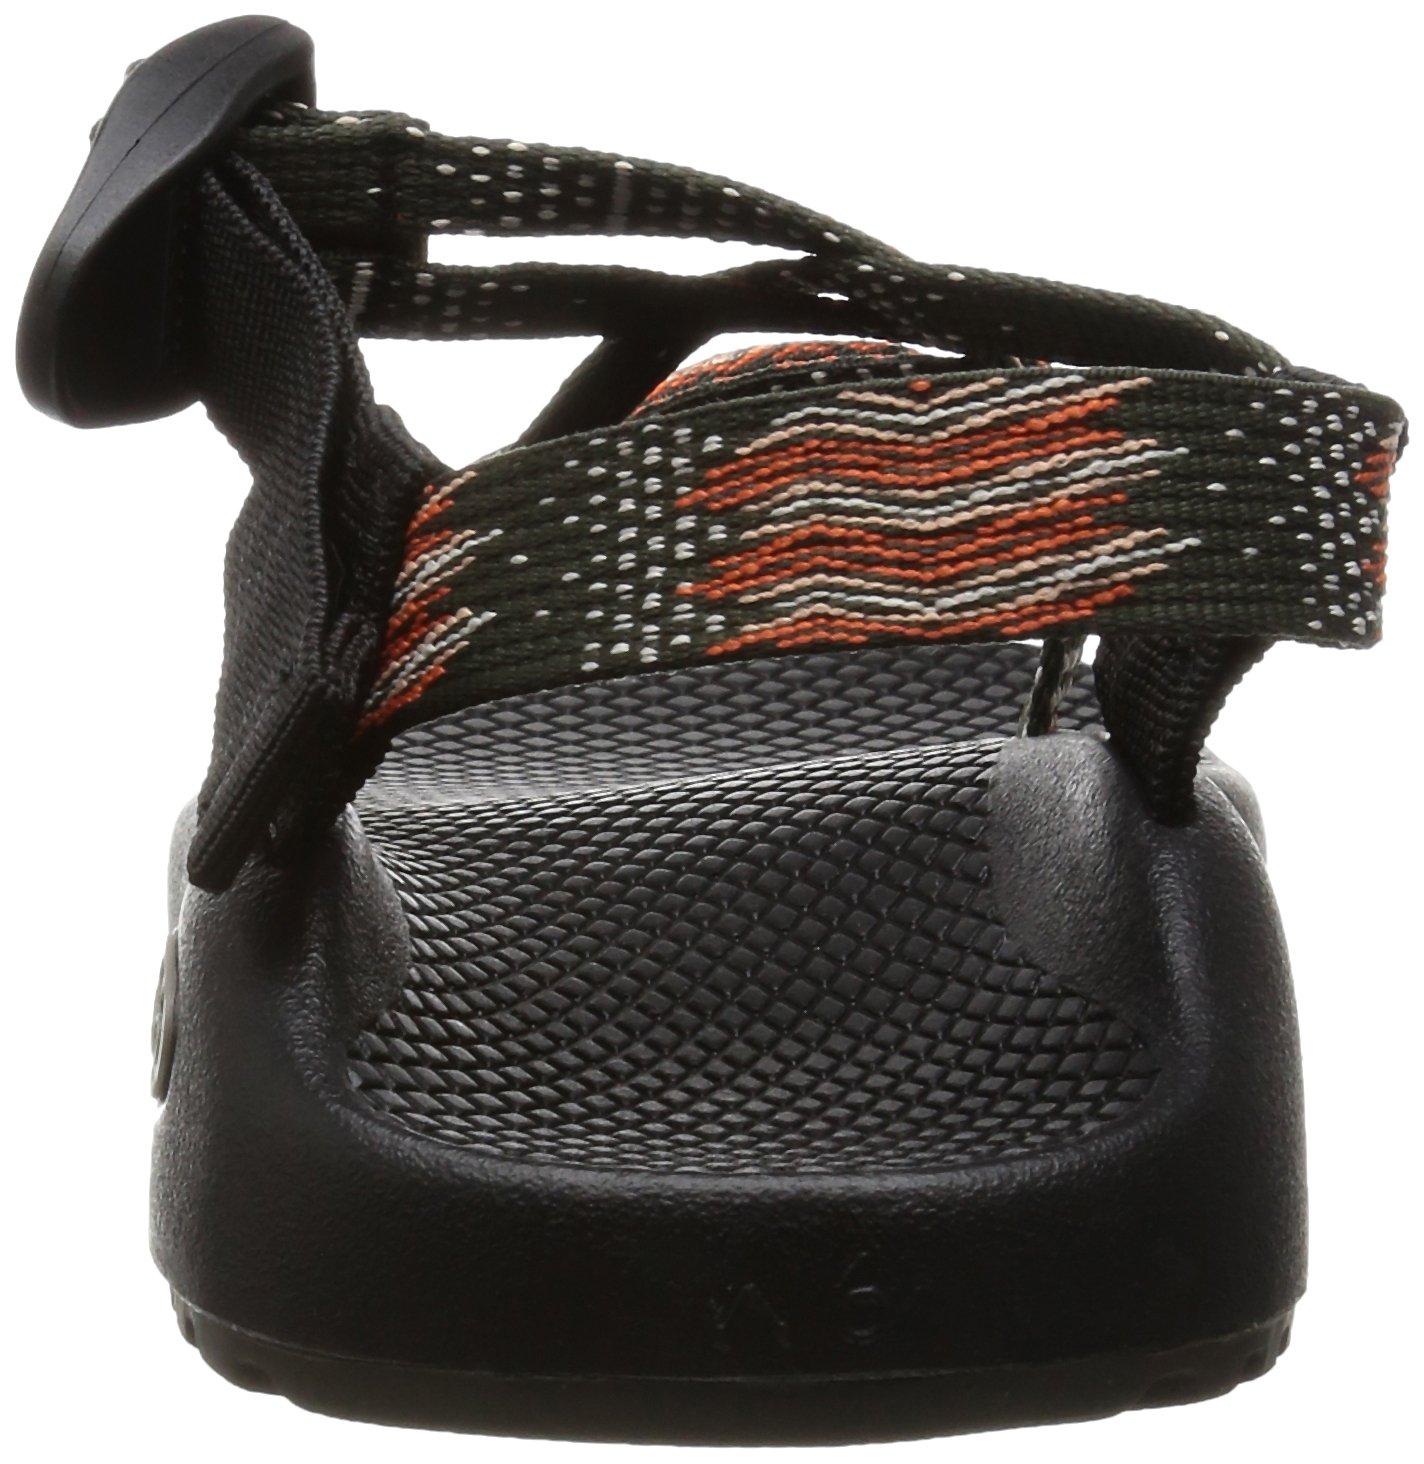 Chaco Women's ZX1 Classic Sport Sandal B011AJFRF2 6 B(M) US Patriot Dreams